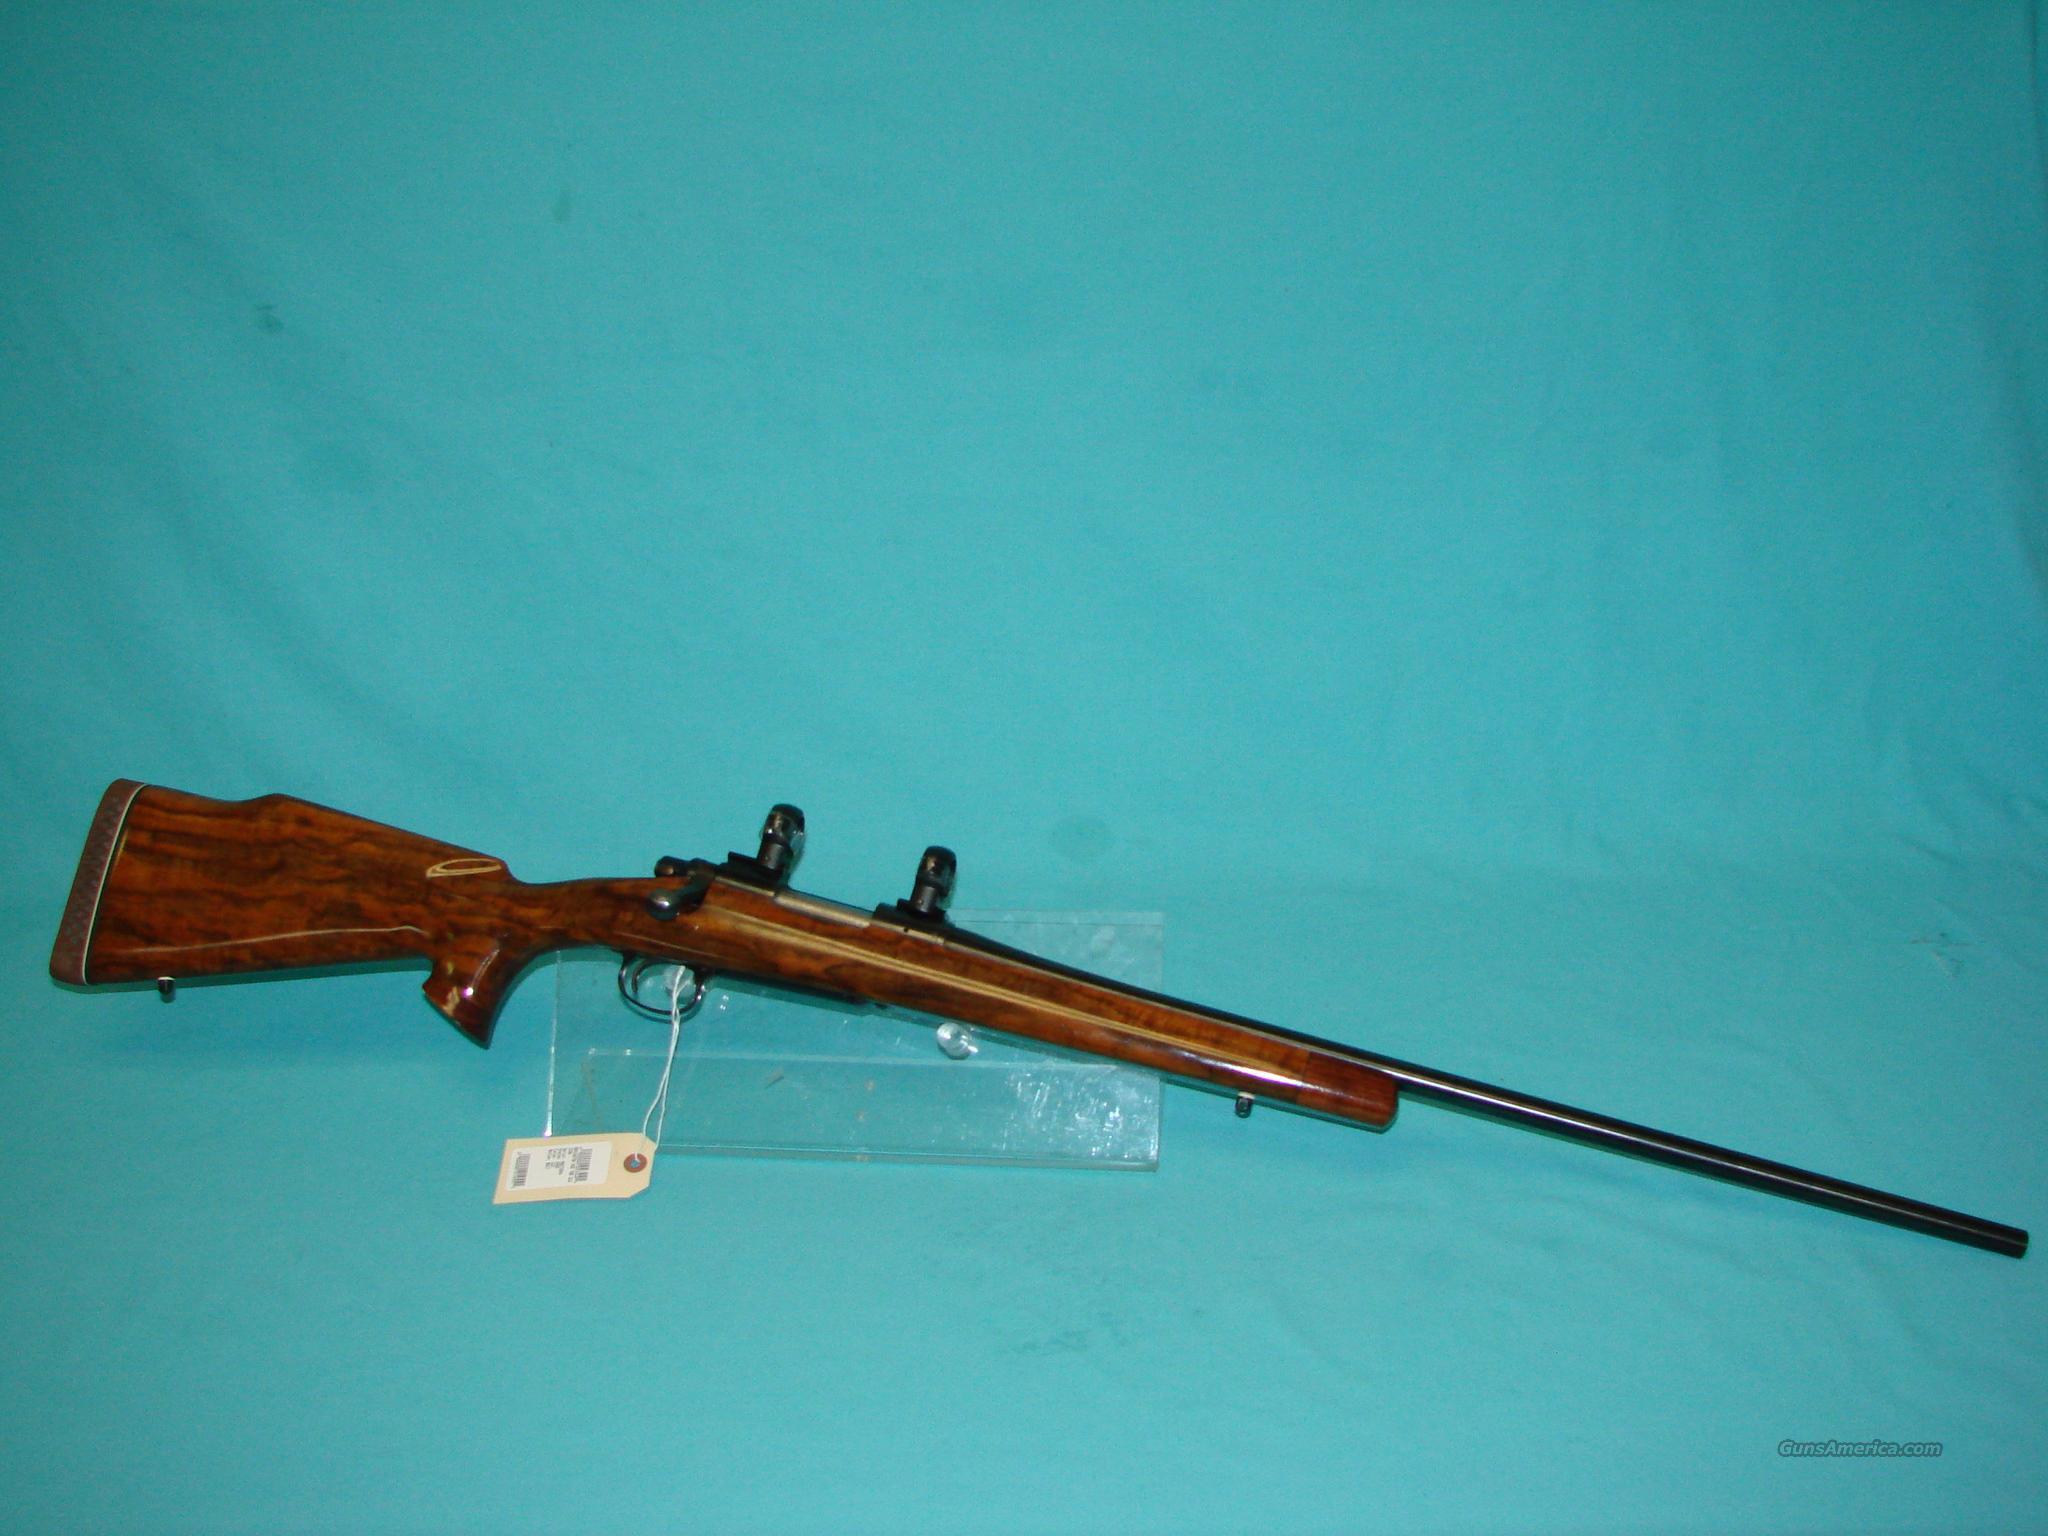 Remington 700 DA Van Horn  Guns > Rifles > Remington Rifles - Modern > Model 700 > Sporting